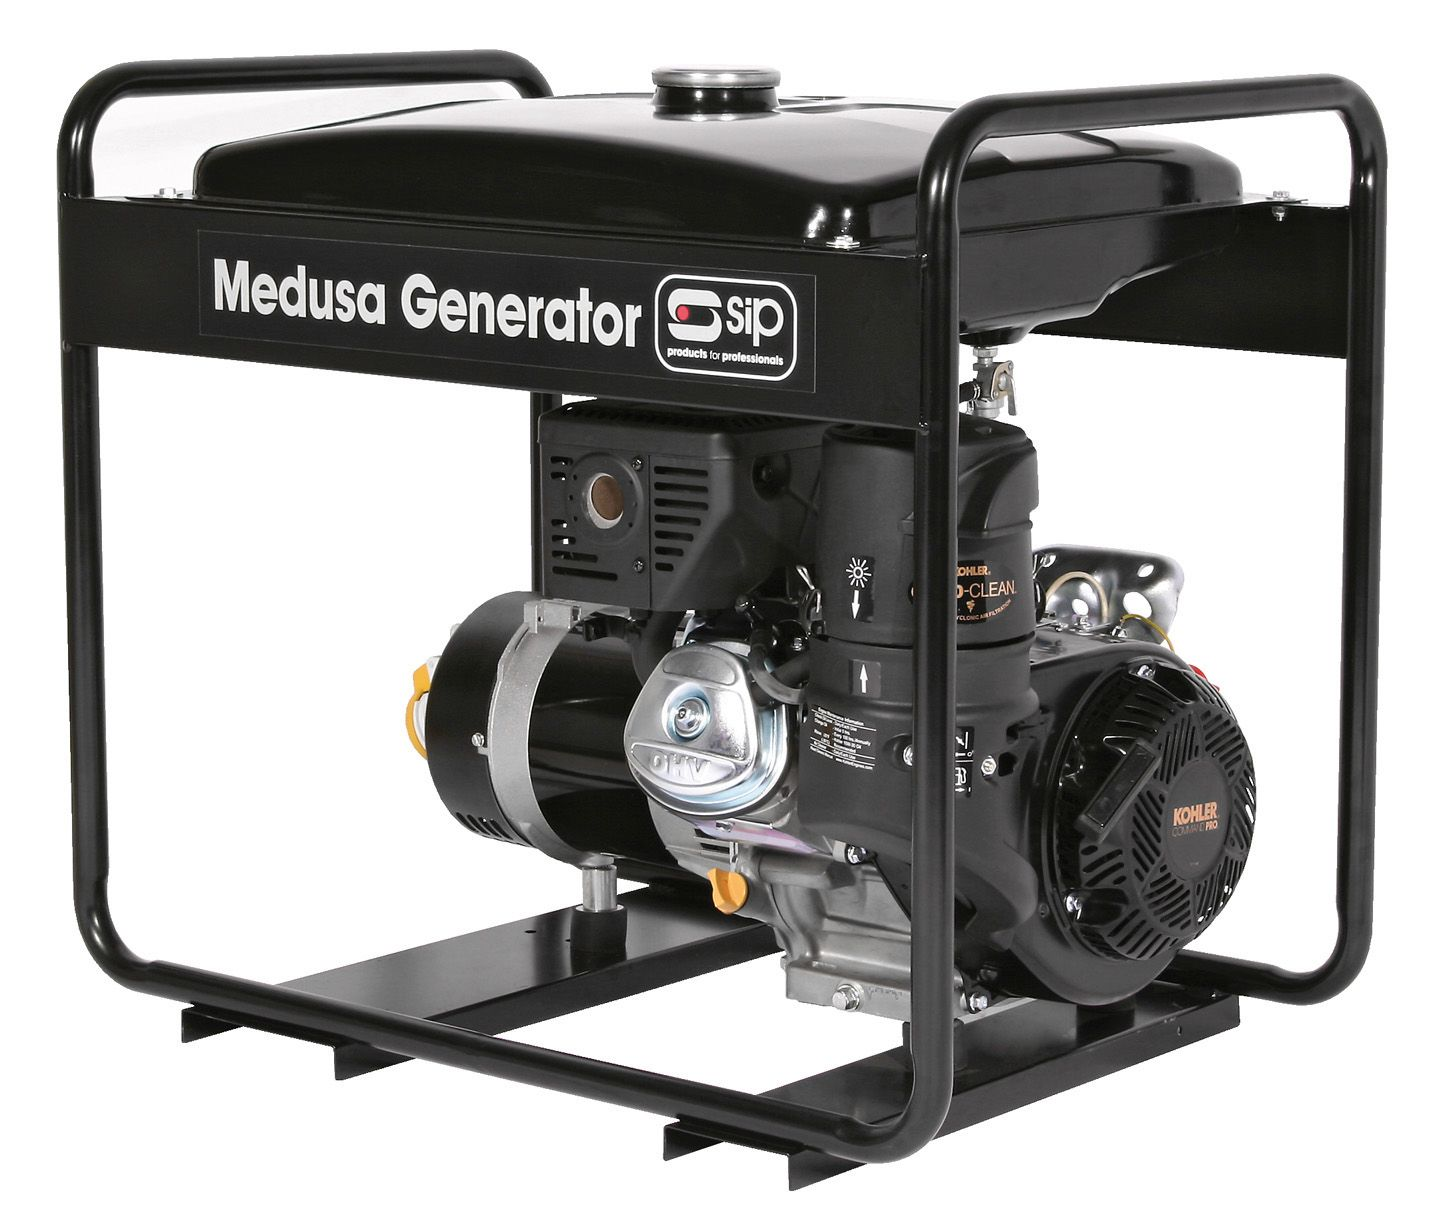 SIP Professional Medusa MGKP4.0FLR 4.5KVA Kohler Long Range Petrol Generator